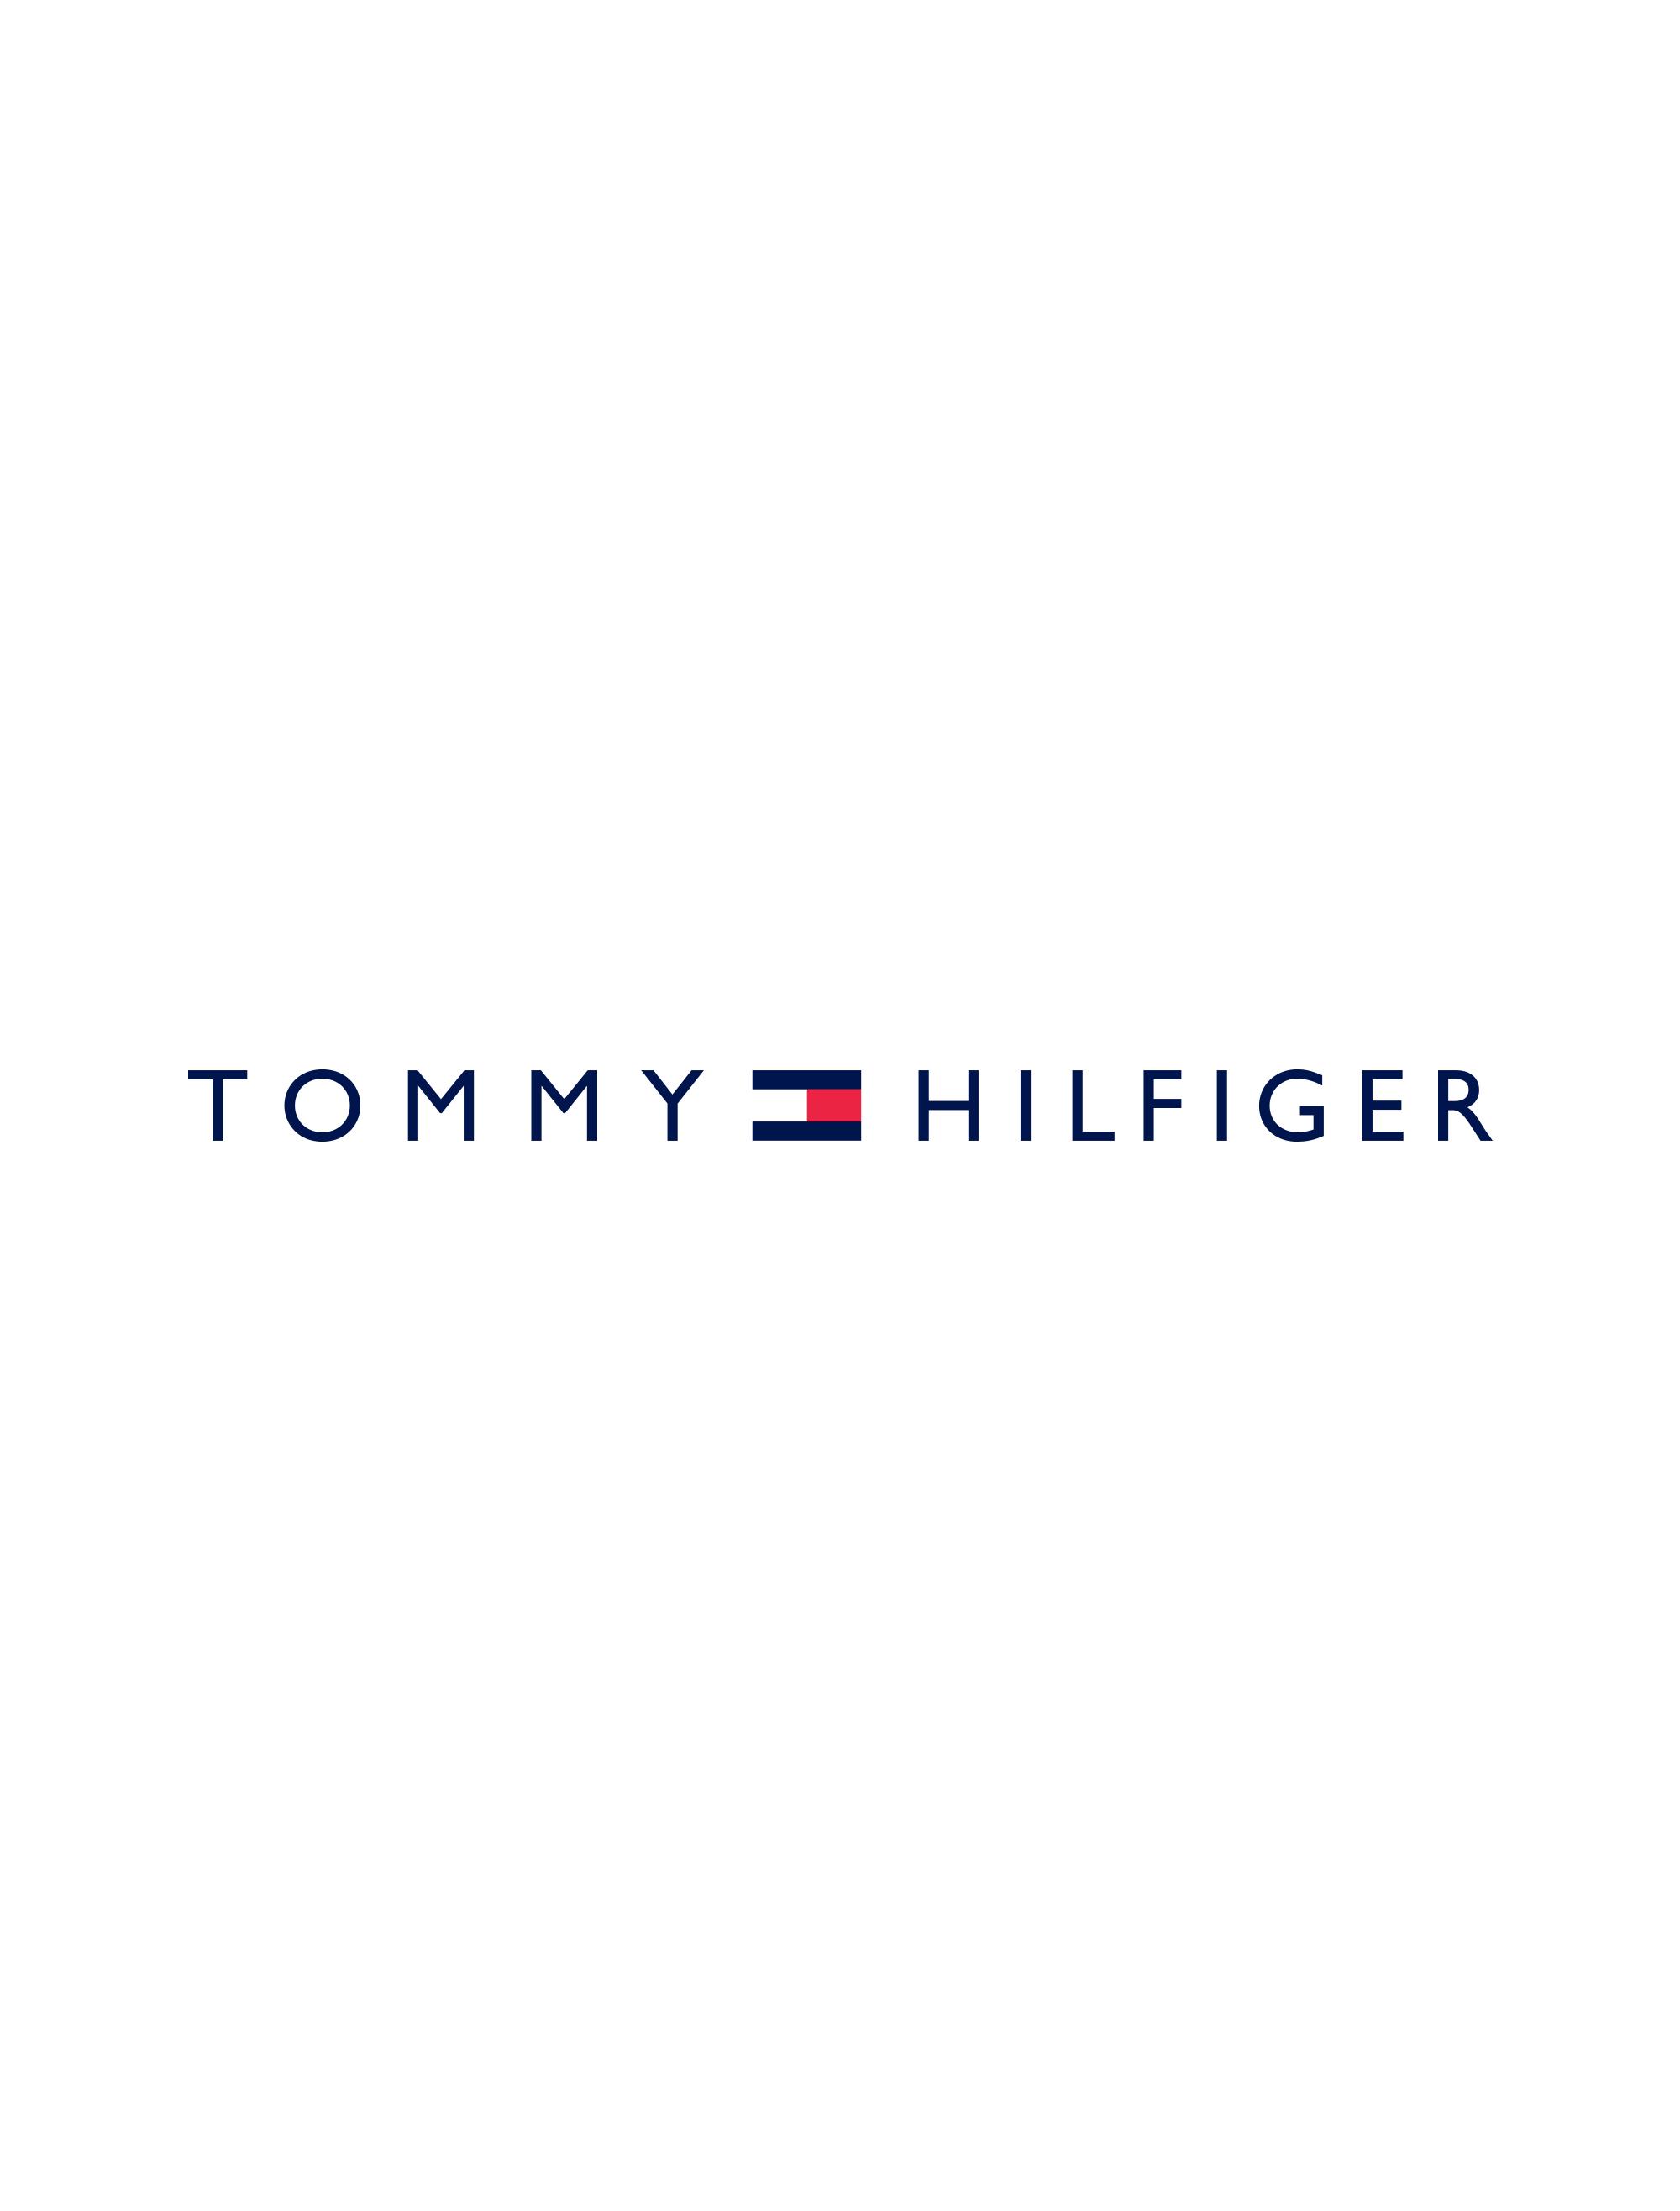 TOMMY HILFIGER YACHT SAILING JACKET -